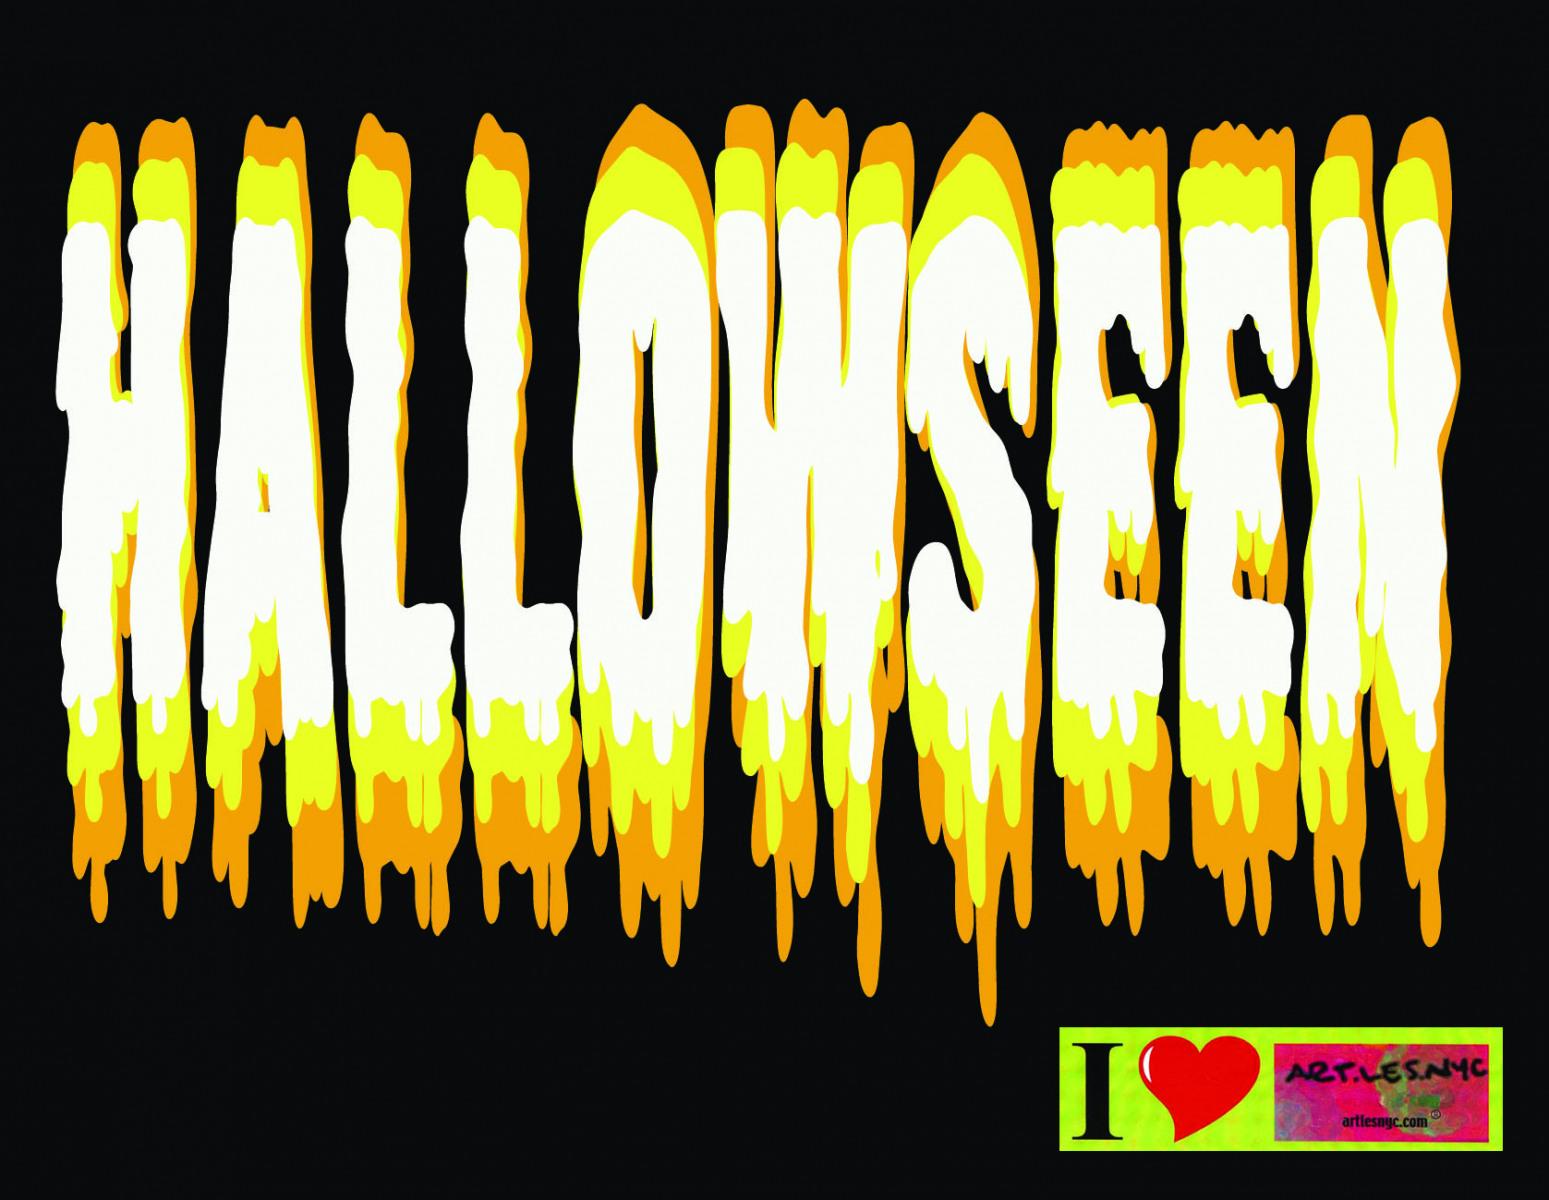 halloseen-postcard